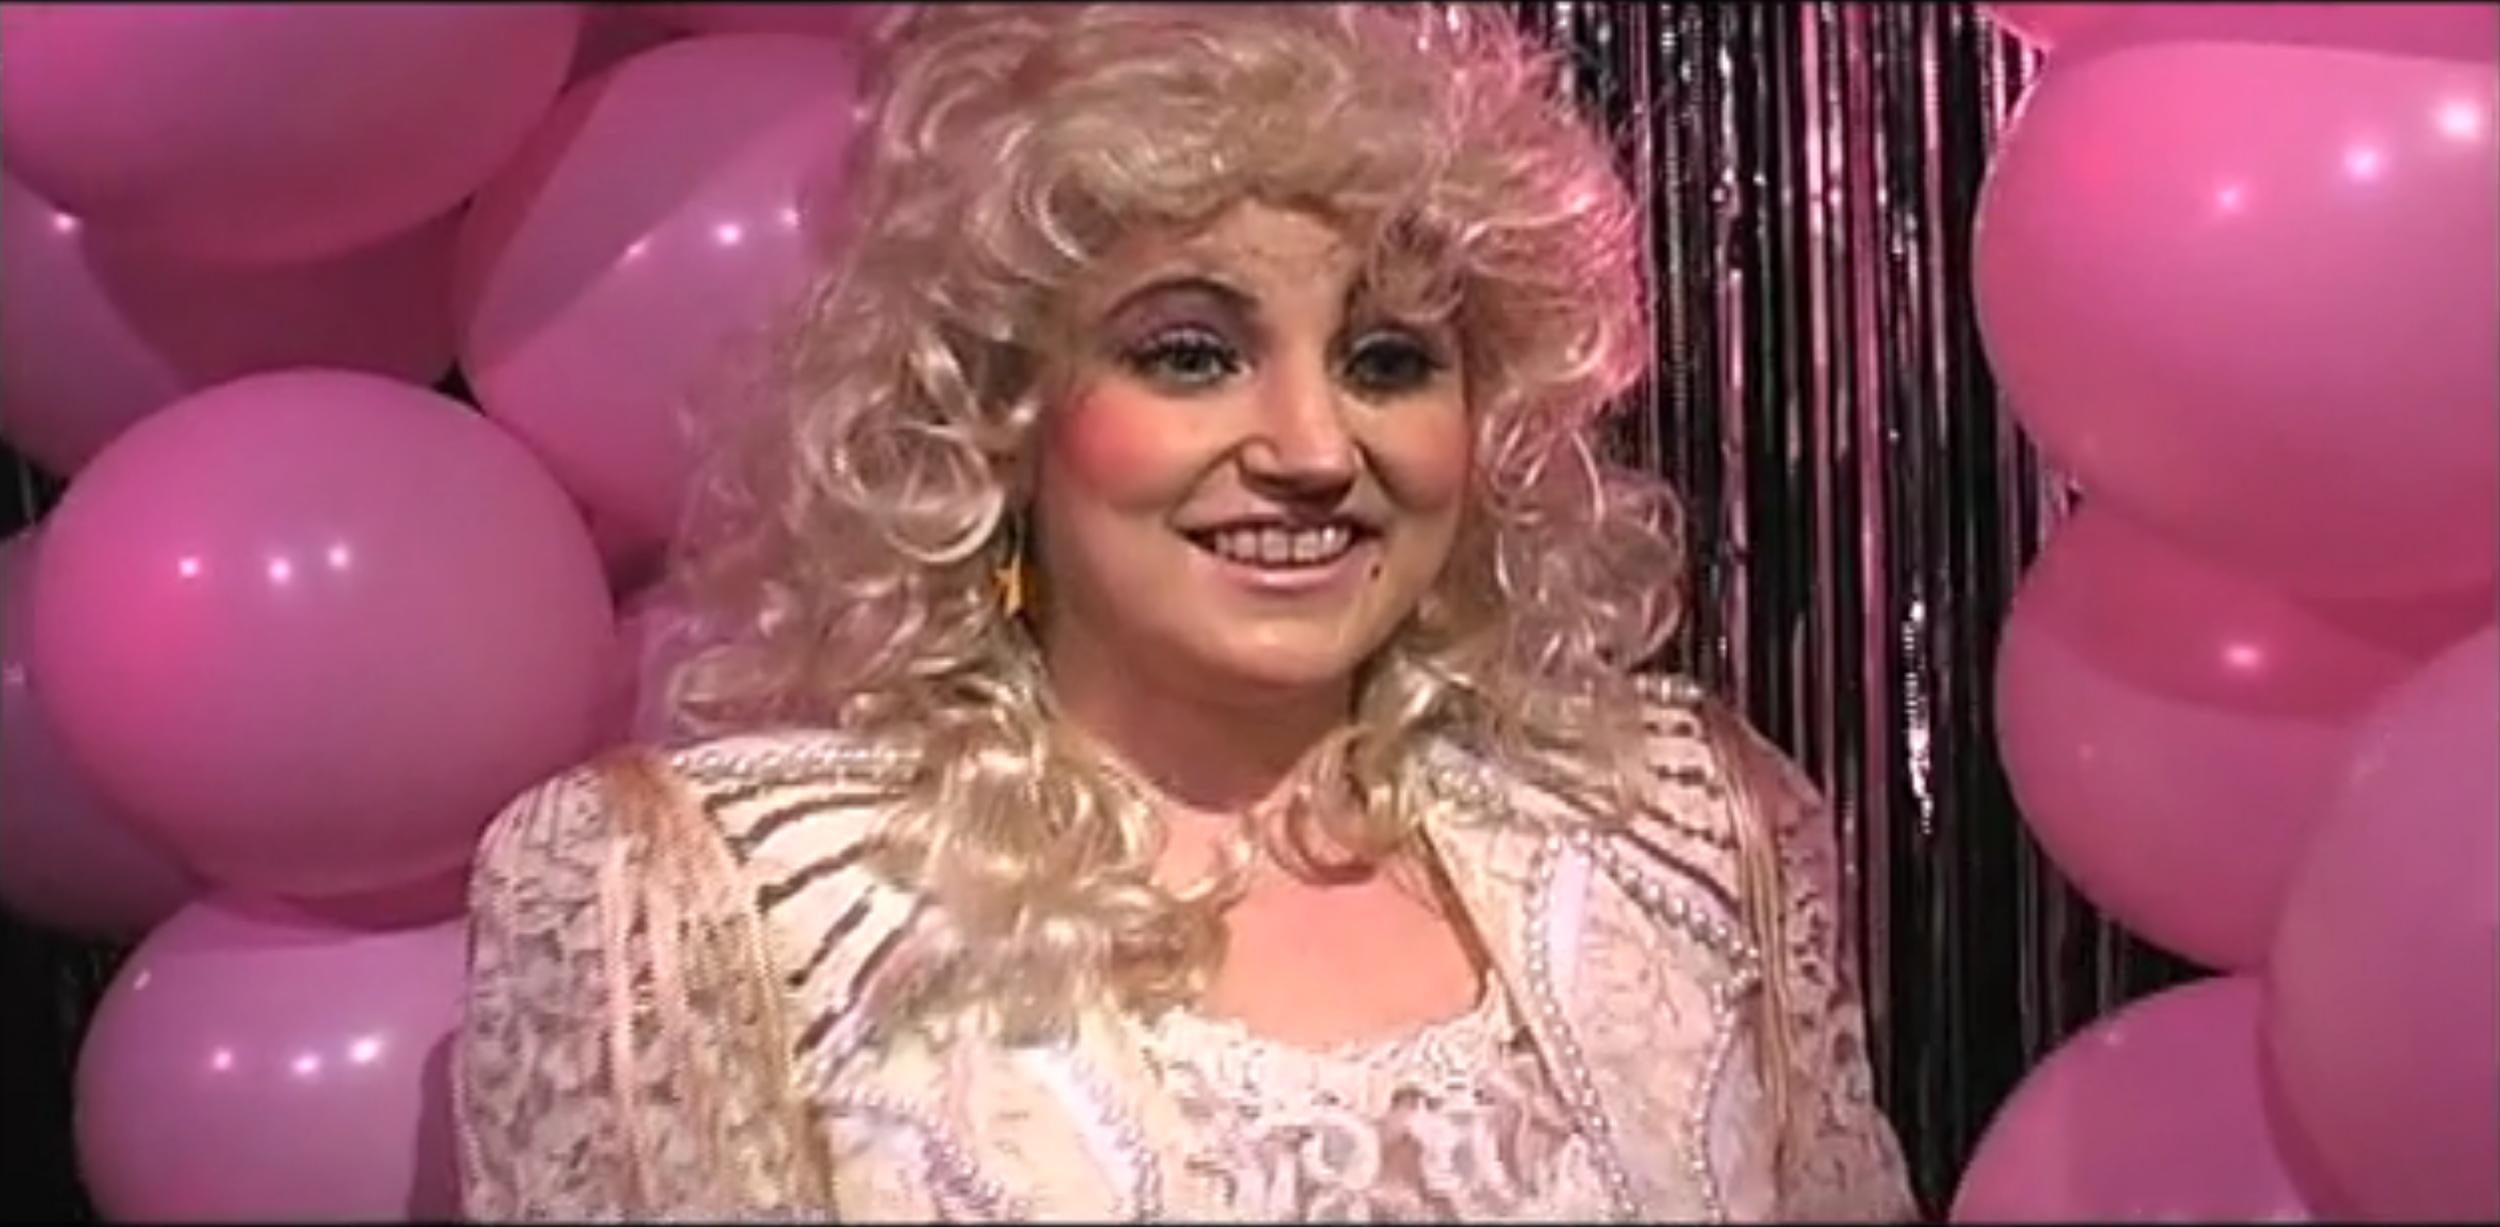 Michele O Medlin as Varna